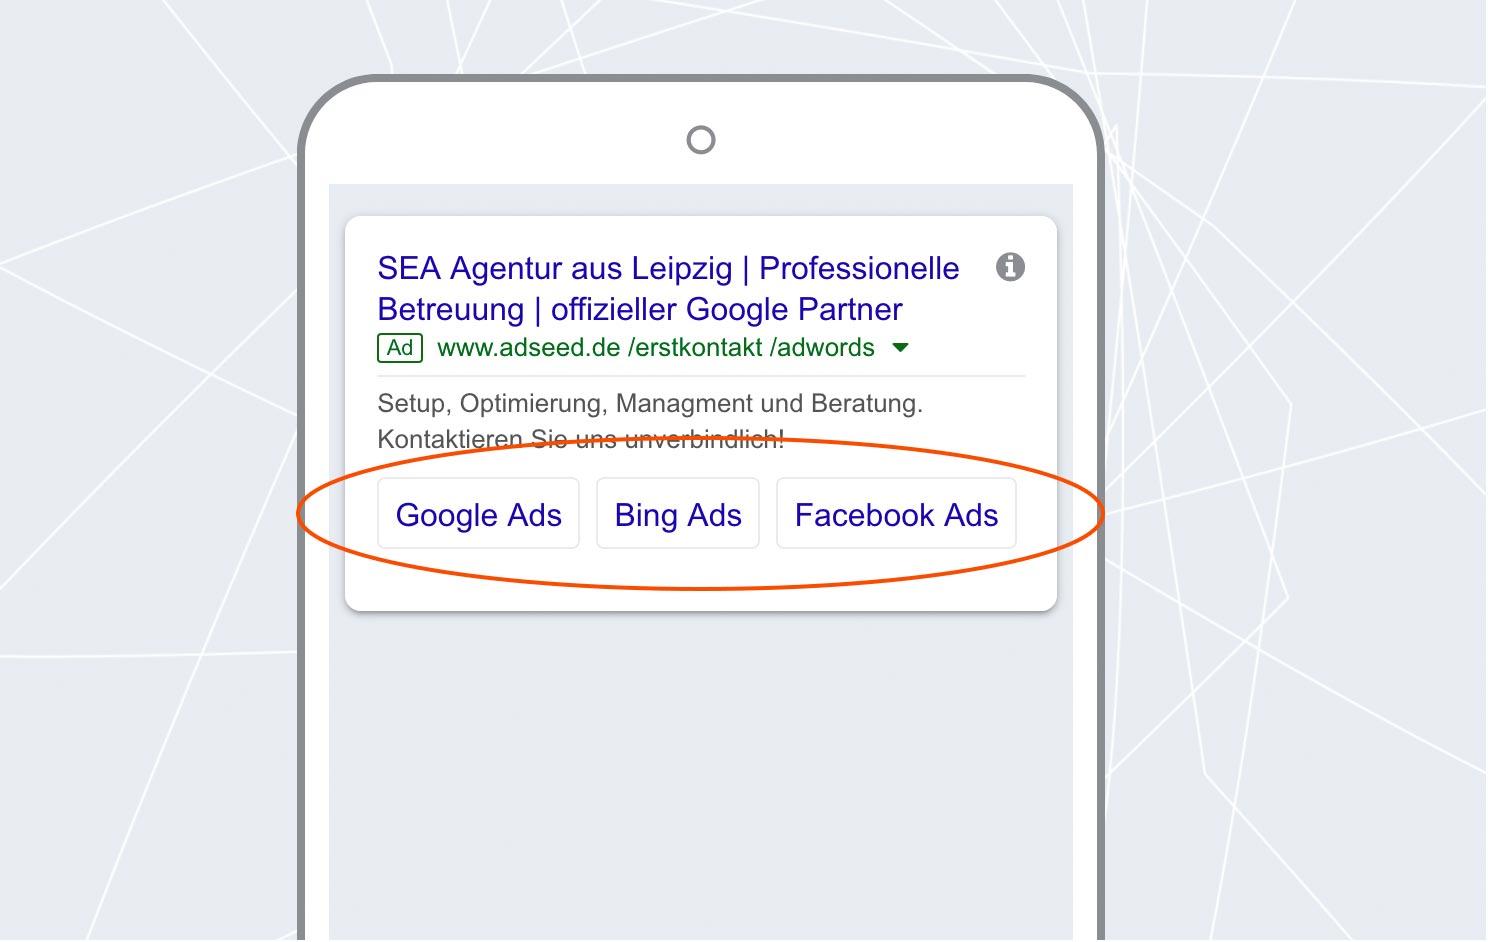 adseed - Google Ads Anzeige Sitelinks Mobil